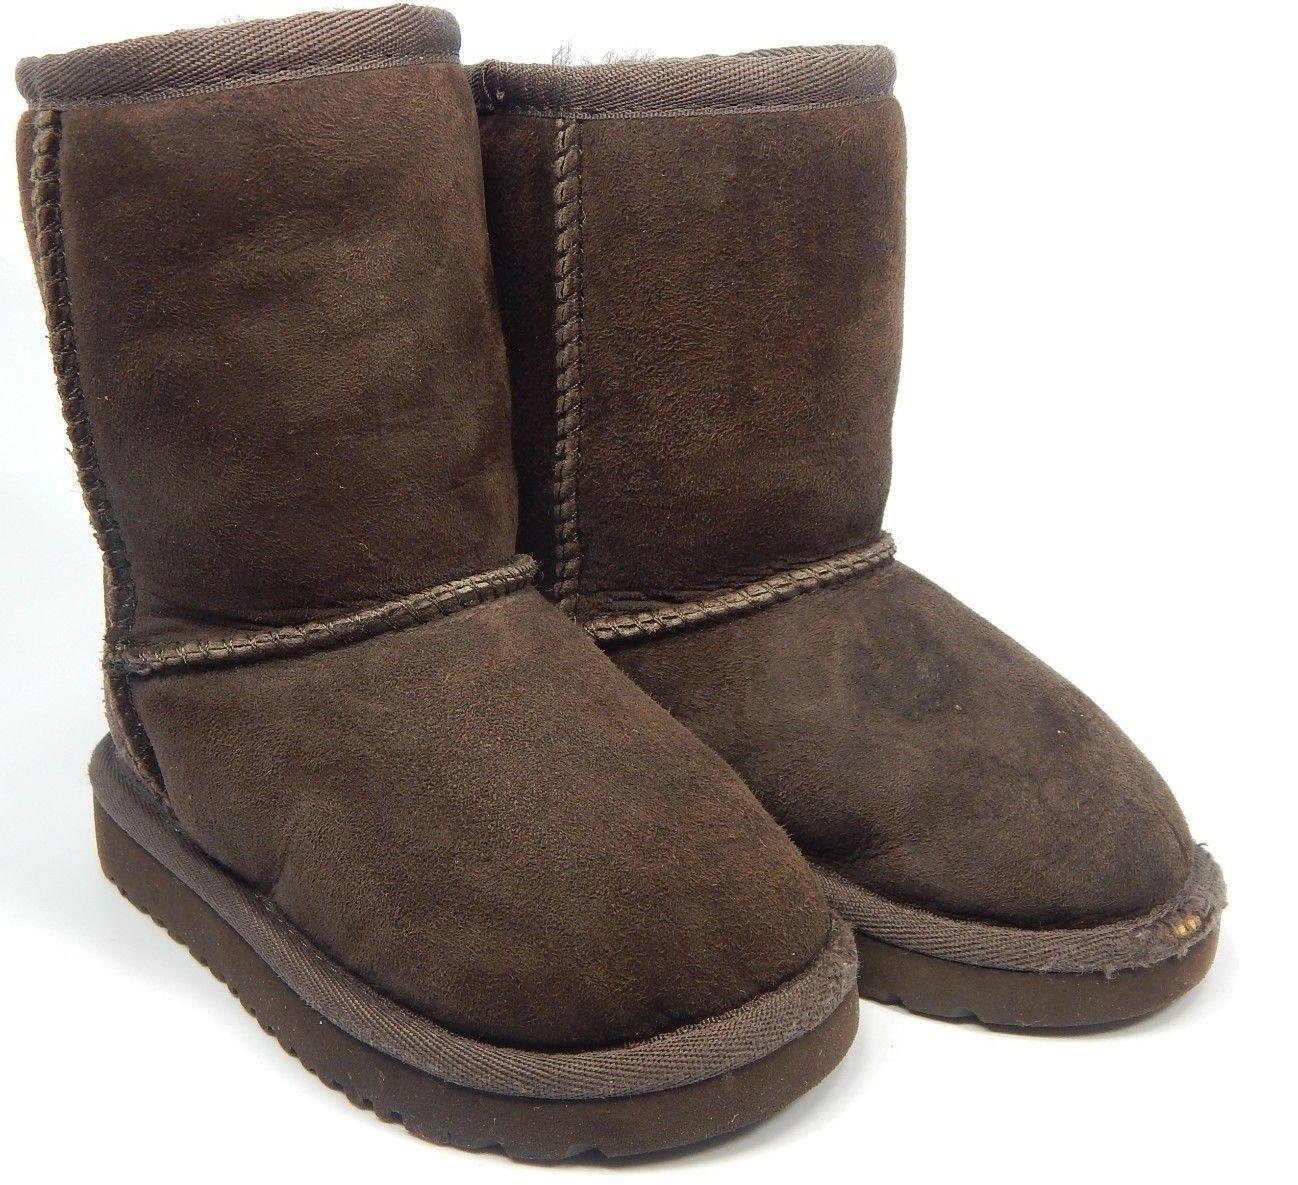 Ugg Australia Classic Brown Short Boots Toddler Little Kids Size 7 5251T